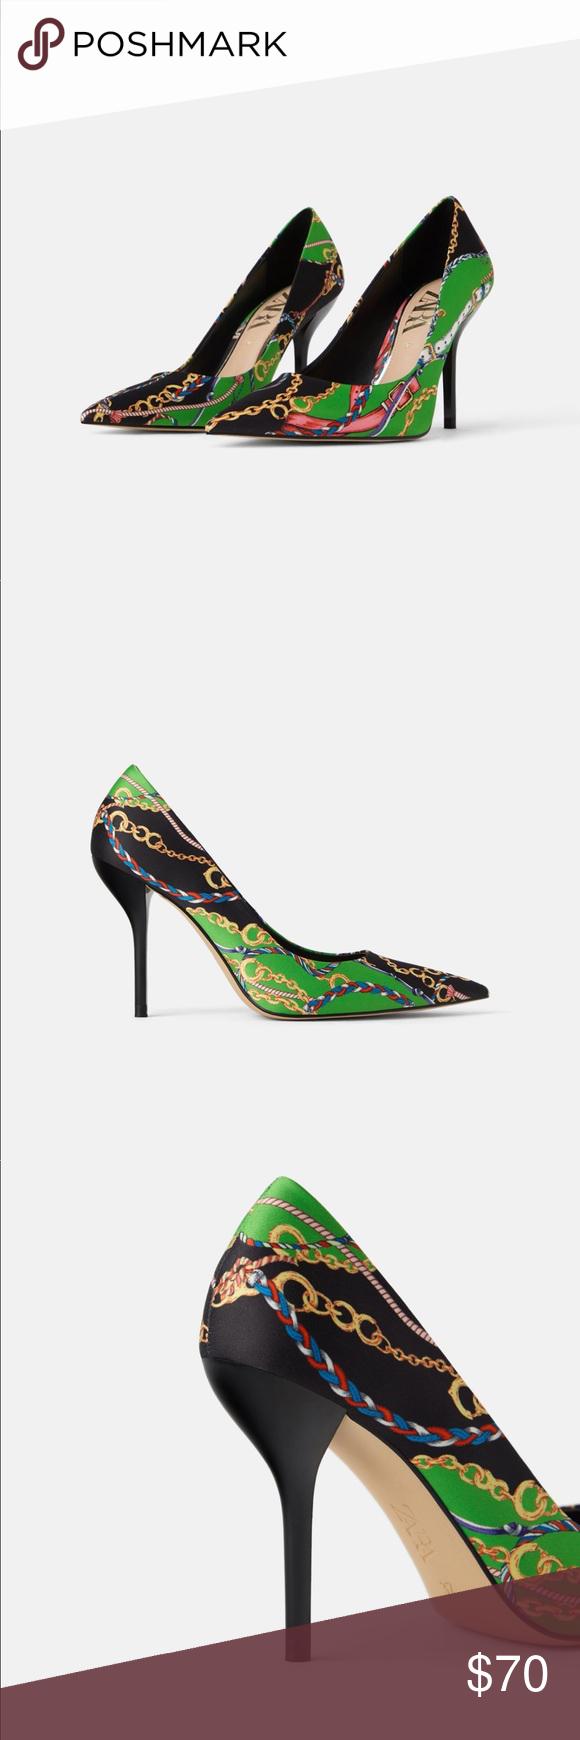 be0f6b094b3 💕Price is firm💕Zara shoes Chain printed high heeled shoes Heel ...